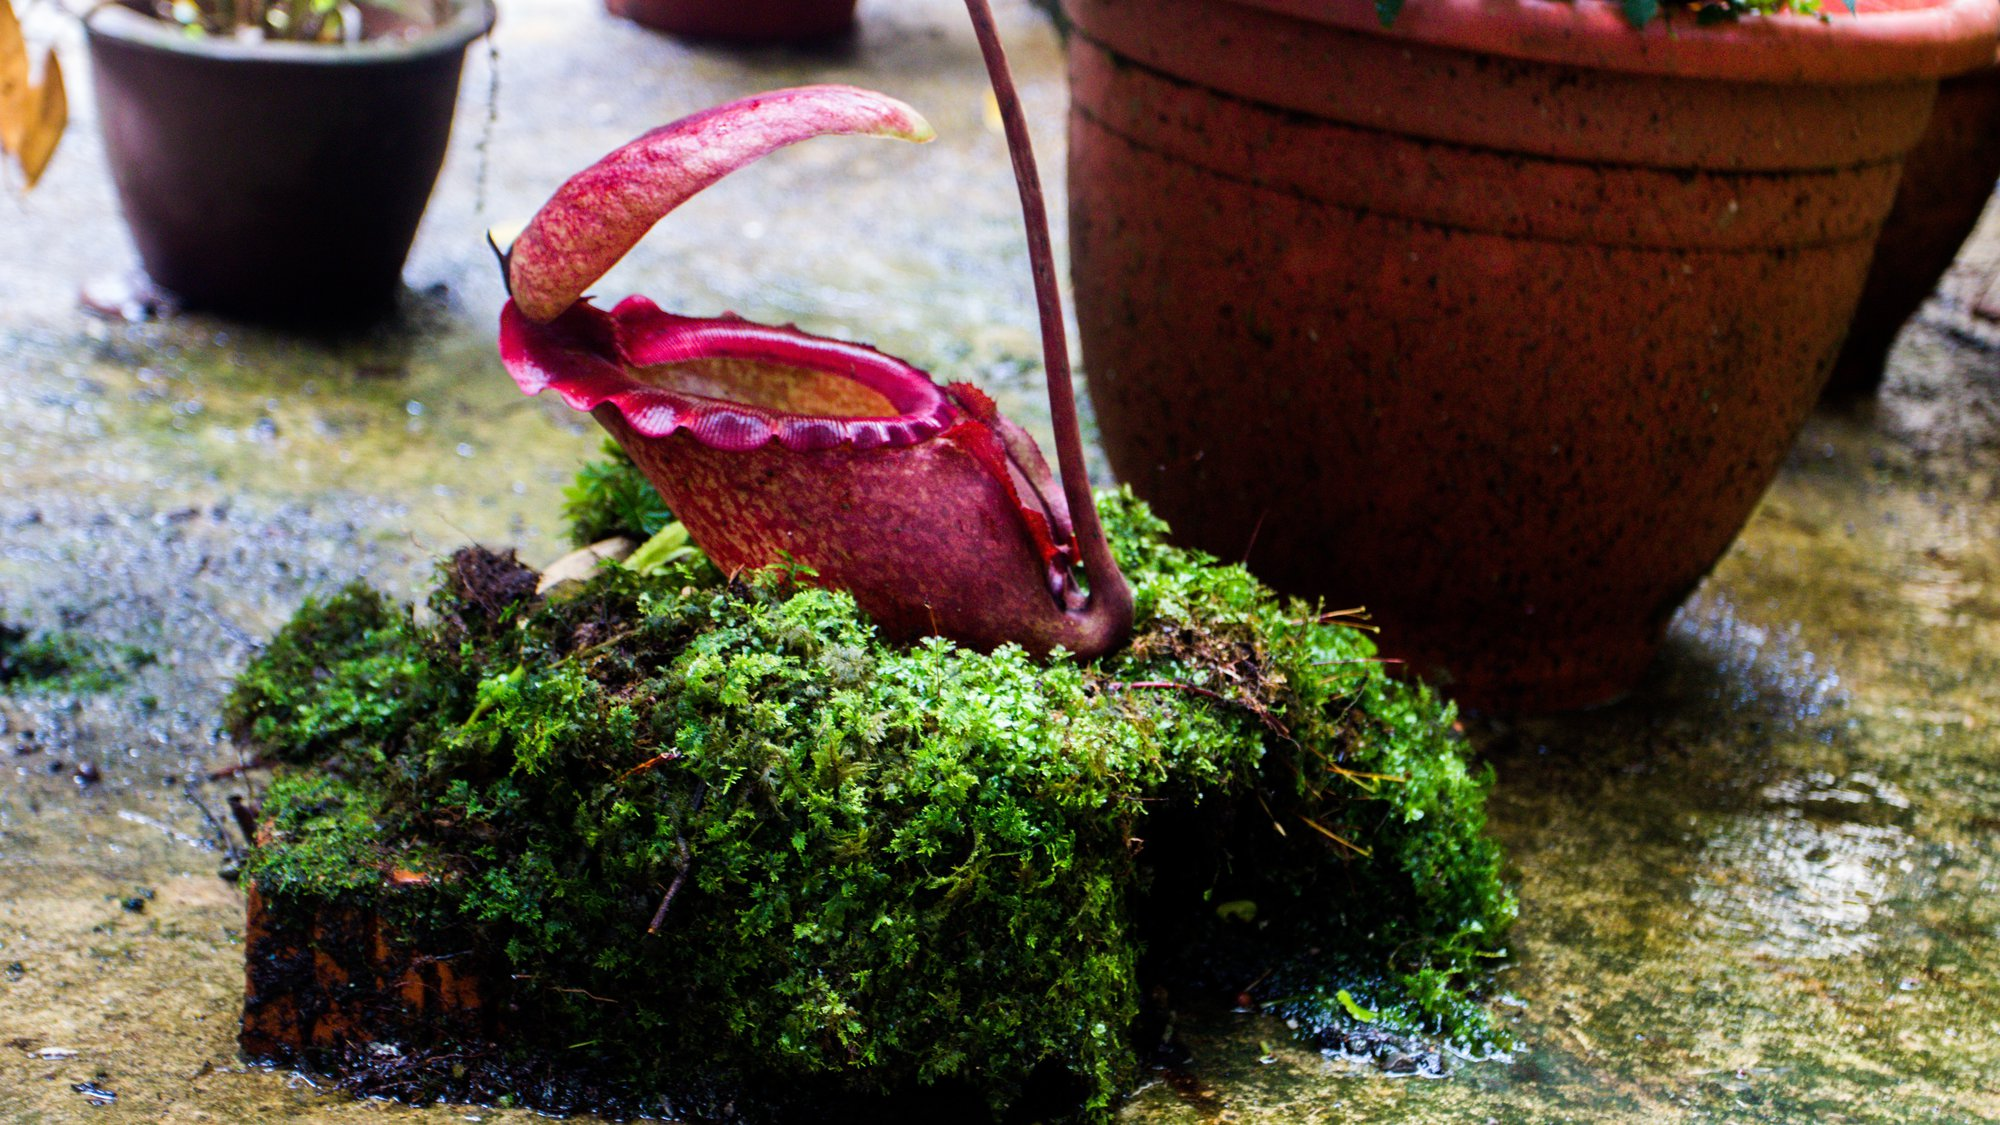 rare carnivorous plant (Nepenthes rajah)